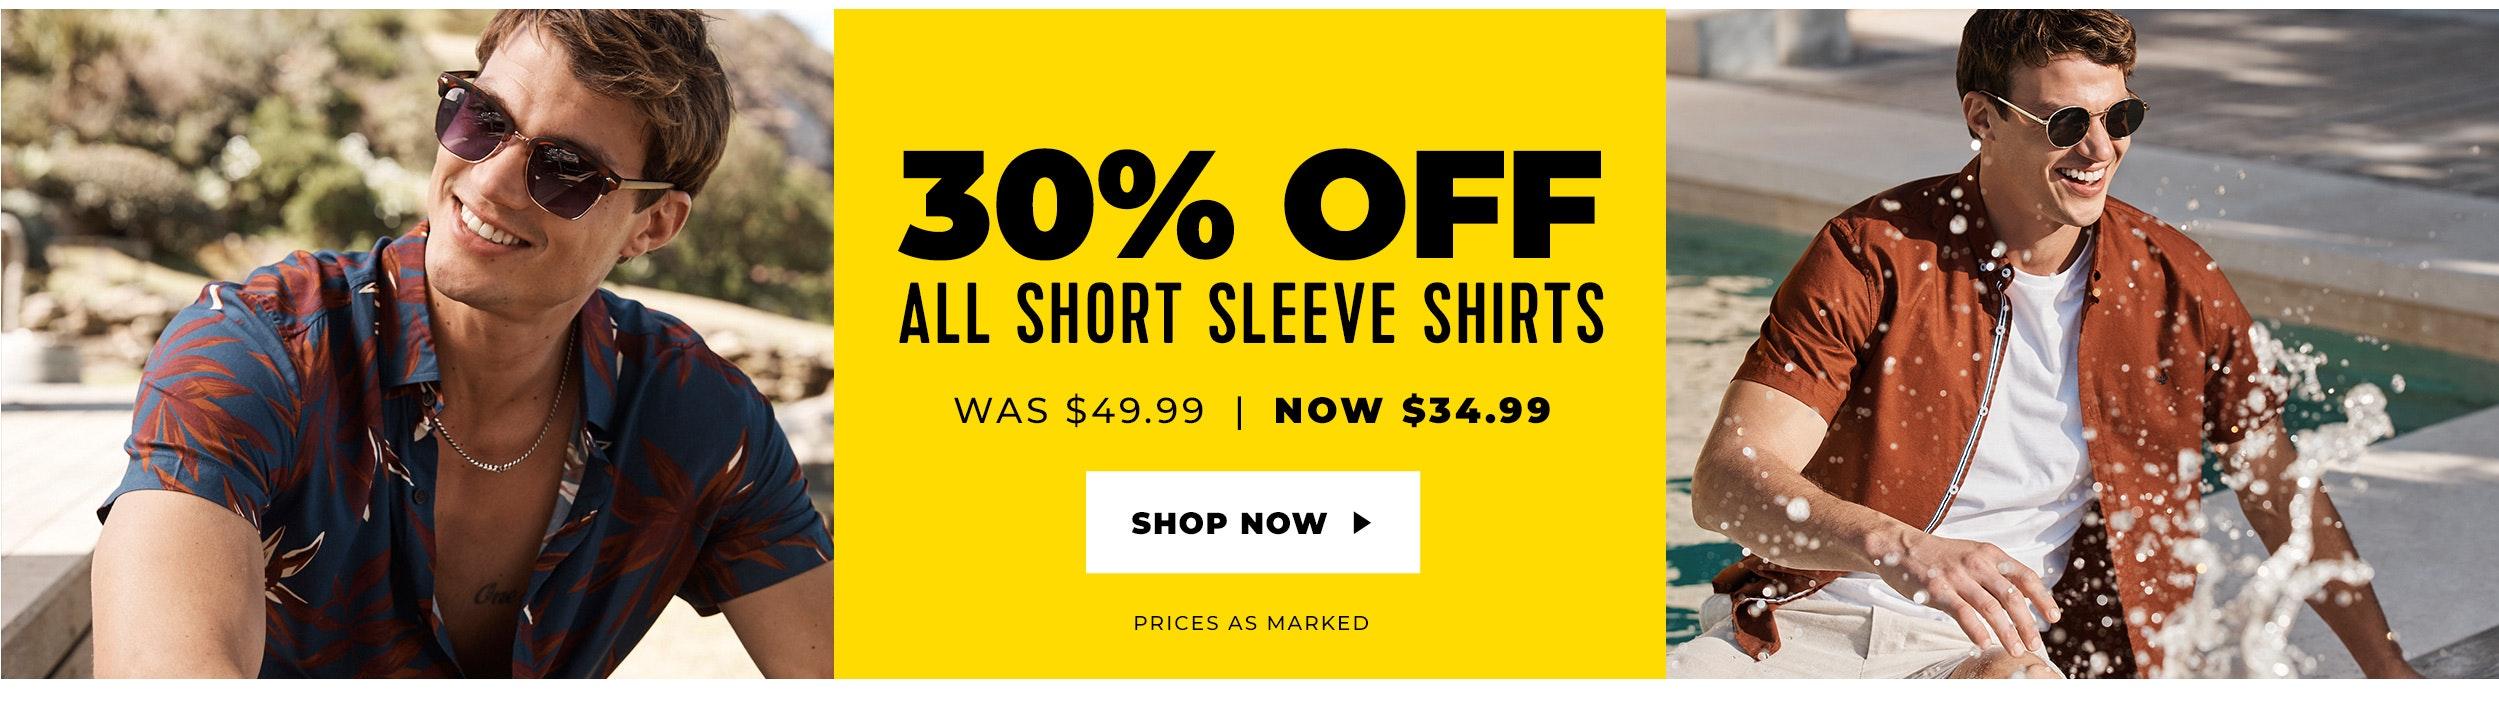 30% off short sleeve shirts